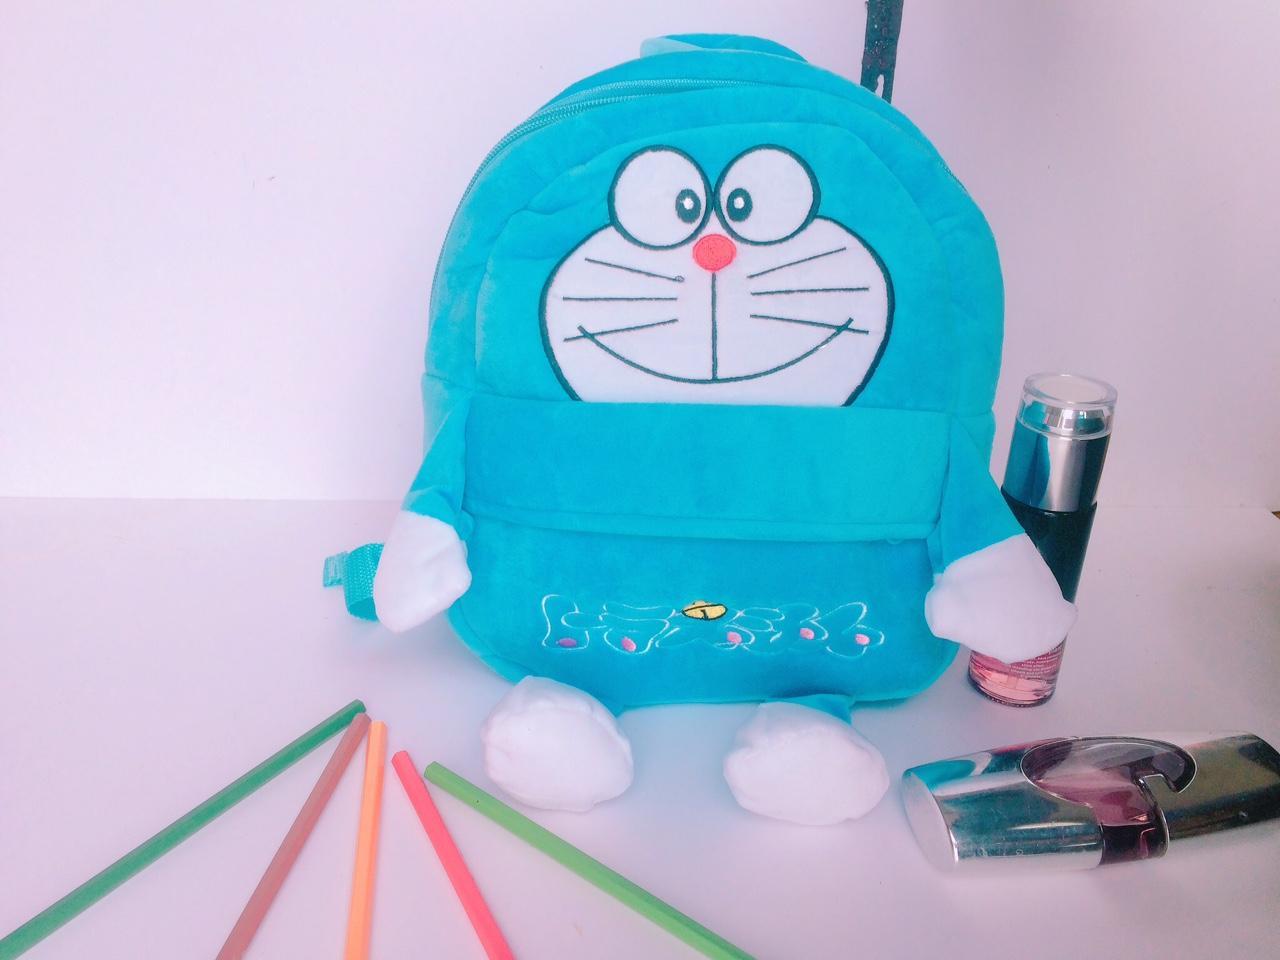 Giá bán Balo Doraemon cho các bé mầm non Newmoon